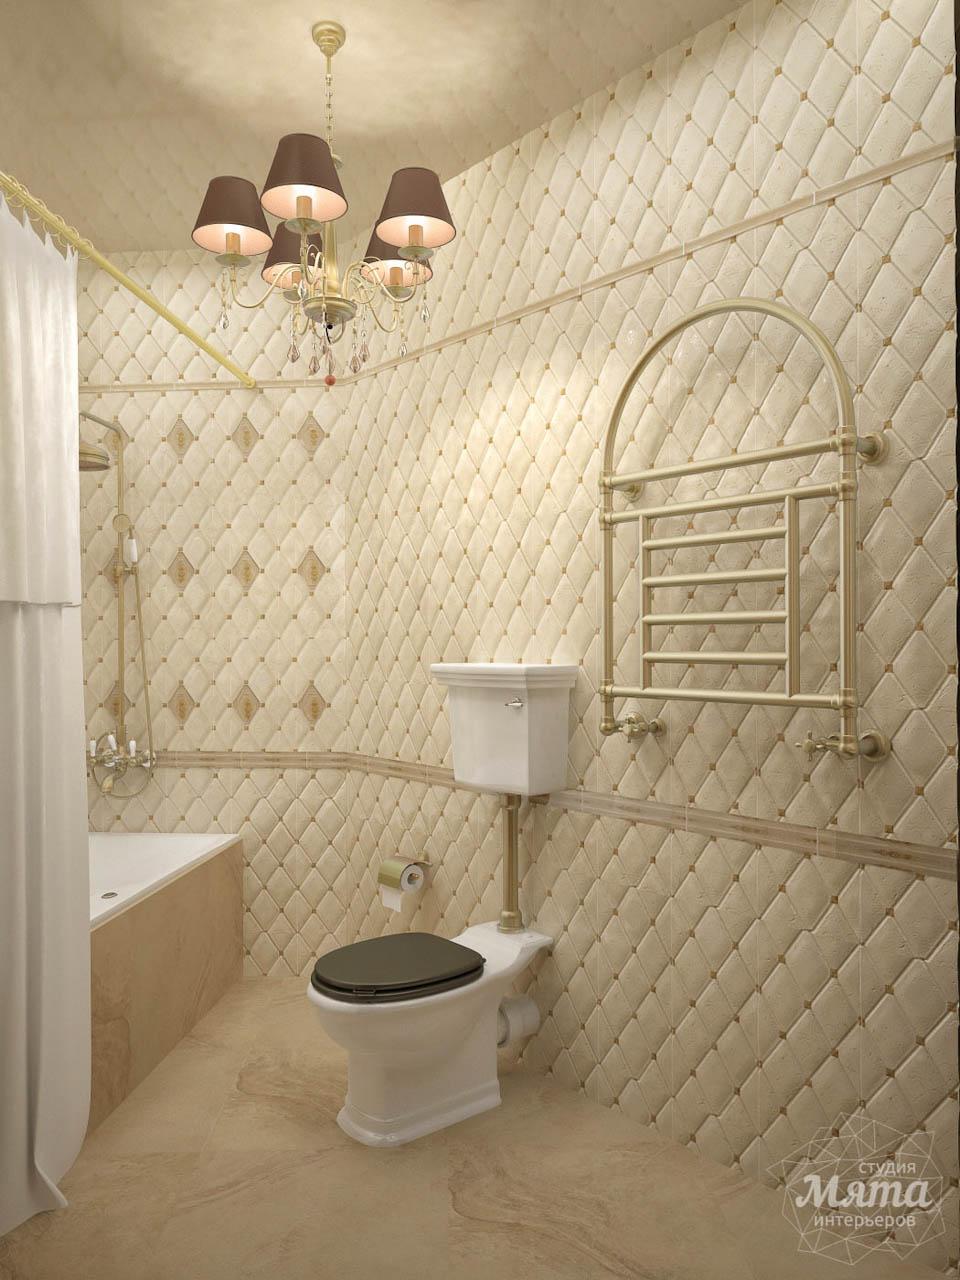 Дизайн интерьера и ремонт трехкомнатной квартиры по ул. 8 Марта 190 img1434557175